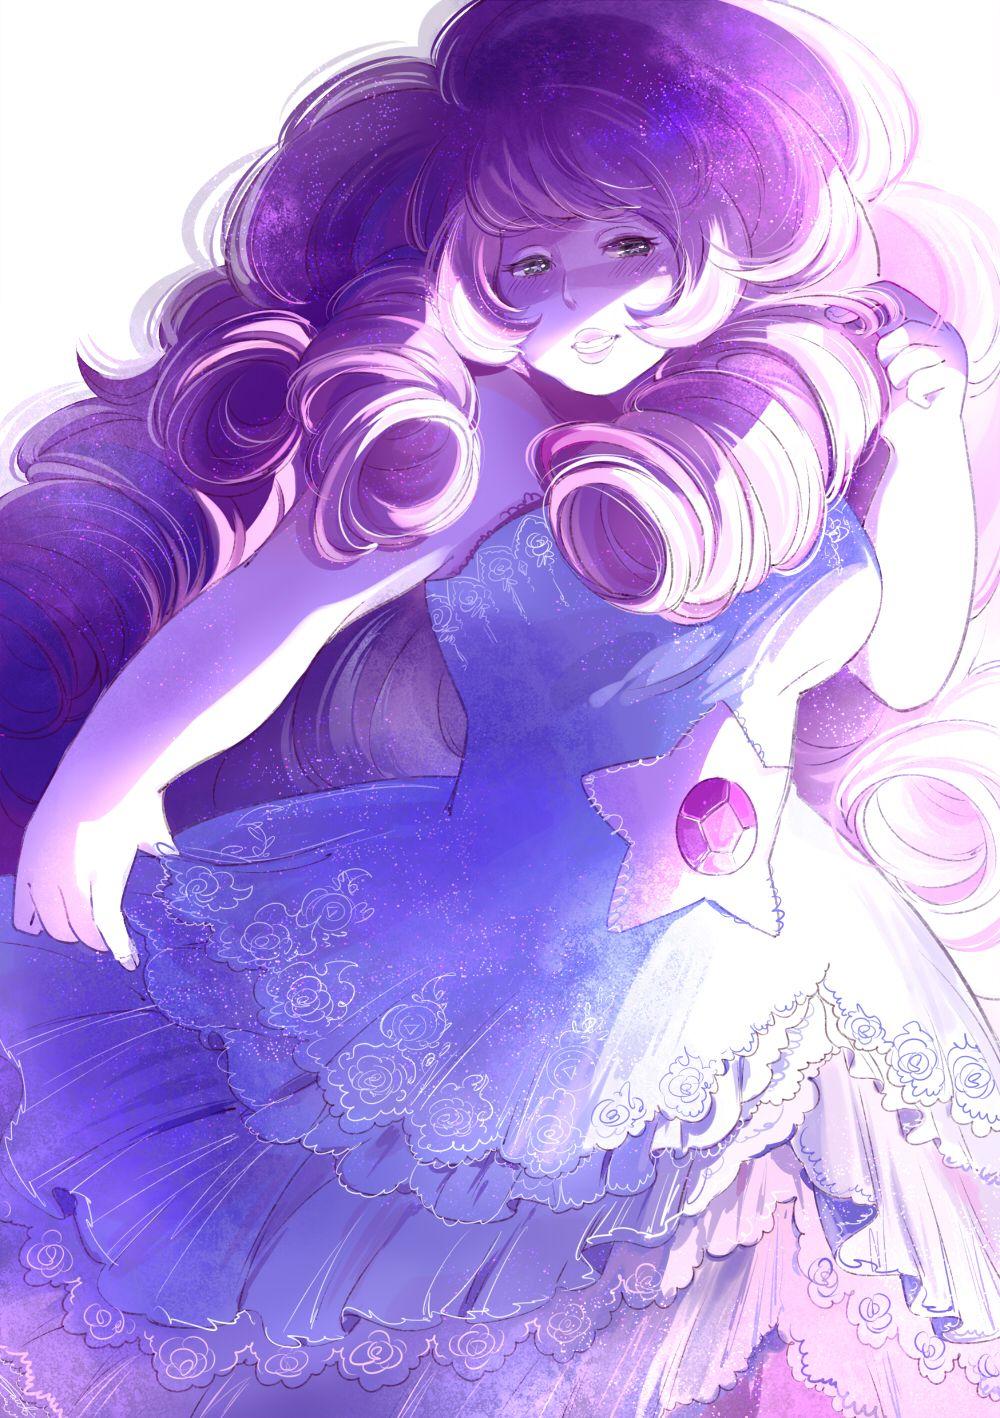 Beautiful rose quartz steven universe steven universe - Rose quartz steven universe wallpaper ...